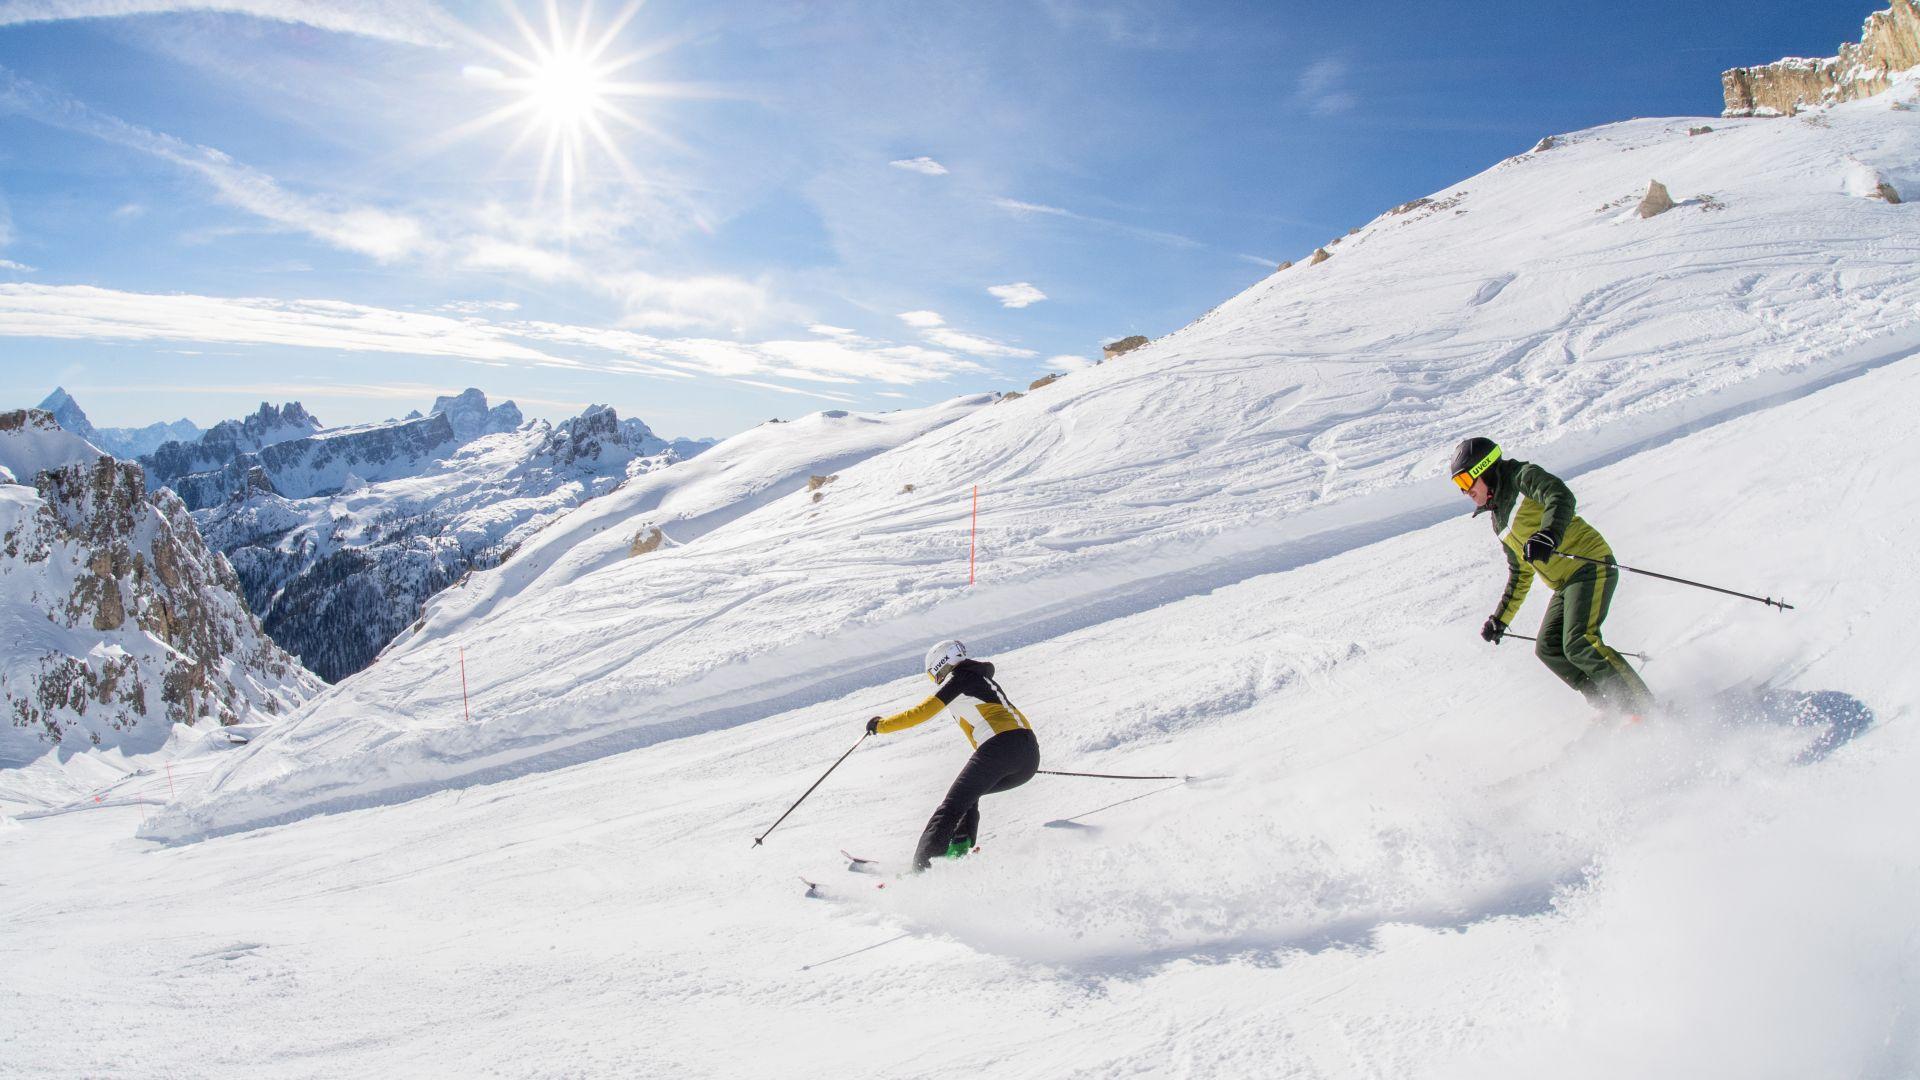 Ski, Italien, Dolomiten, Marmolada, Gruppenreisen, Reisen, Snowboard, Skikurse, Kinderbetreuung, Winter,